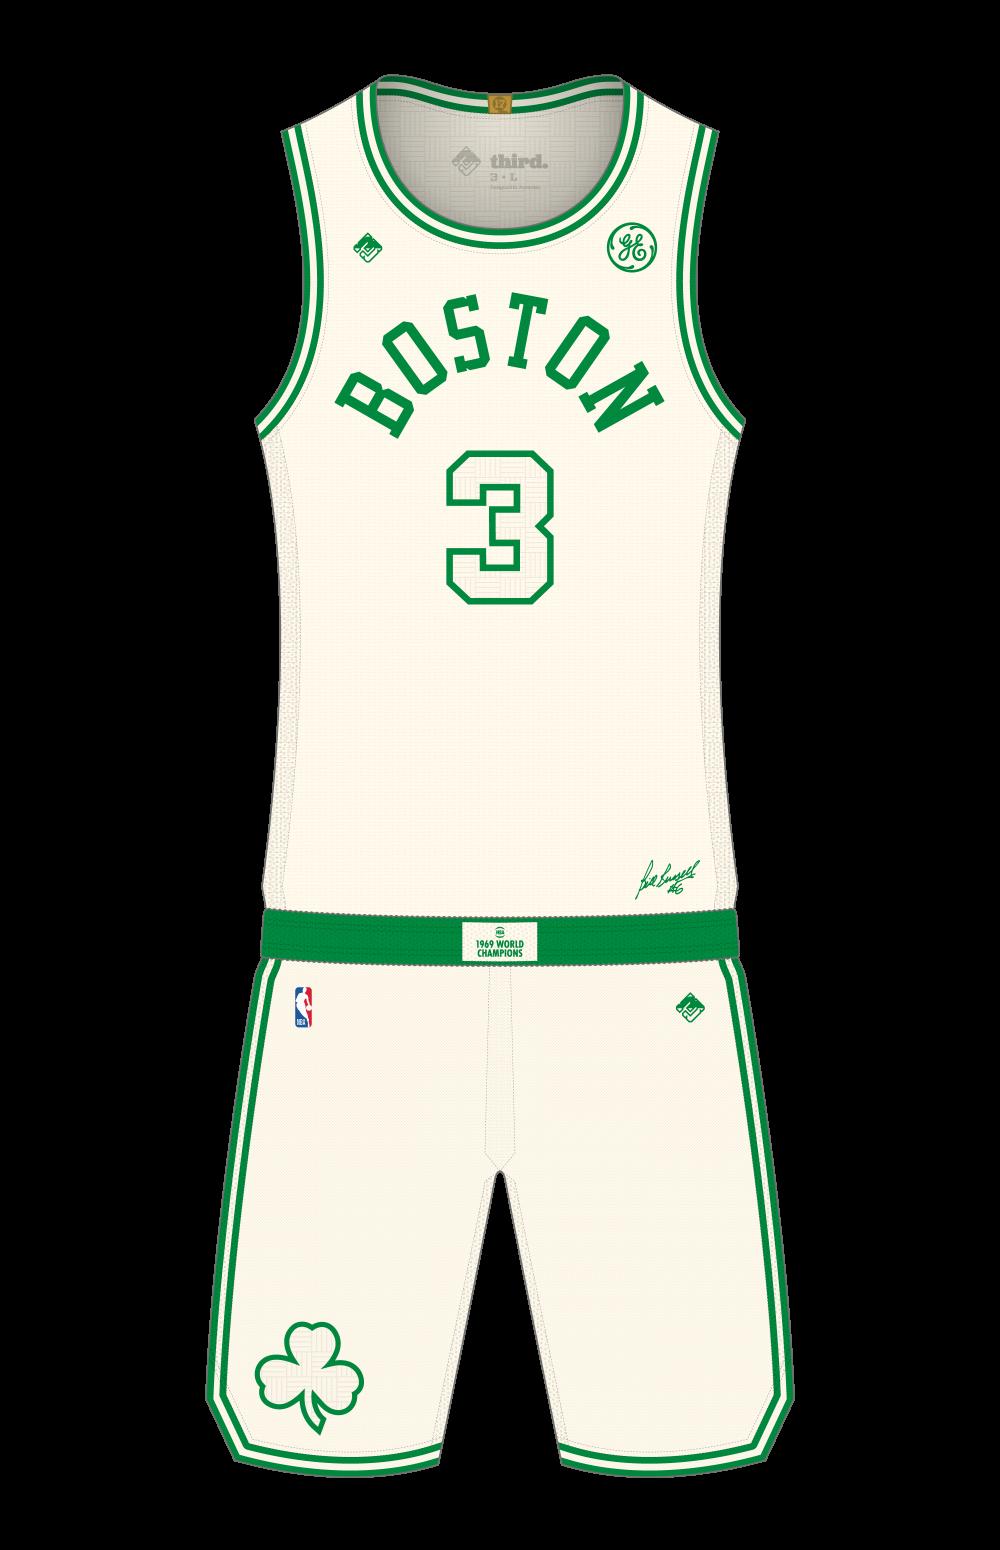 Boston Celtics City Edition 2019 Third Sports Design By Dean Robinson